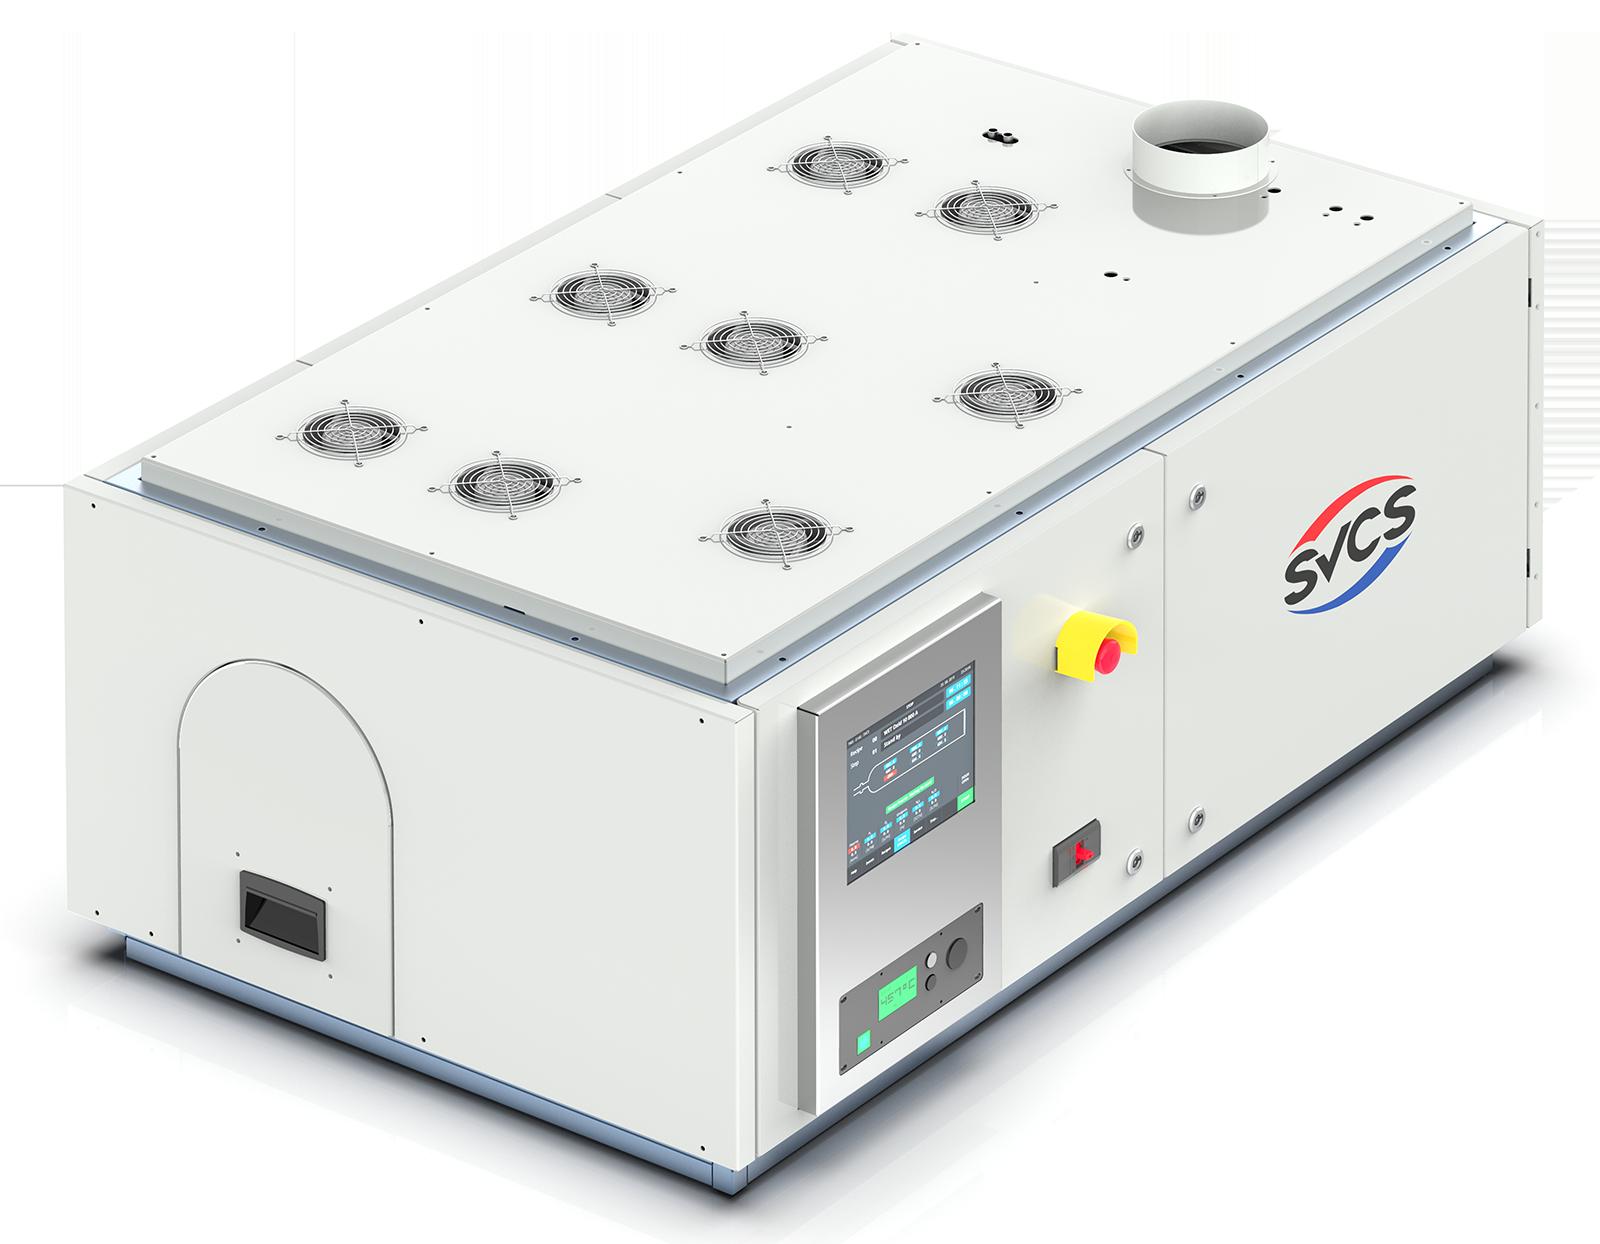 https://empbv.com/wp-content/uploads/2020/05/svcs_compact-tabletop-furnace.png